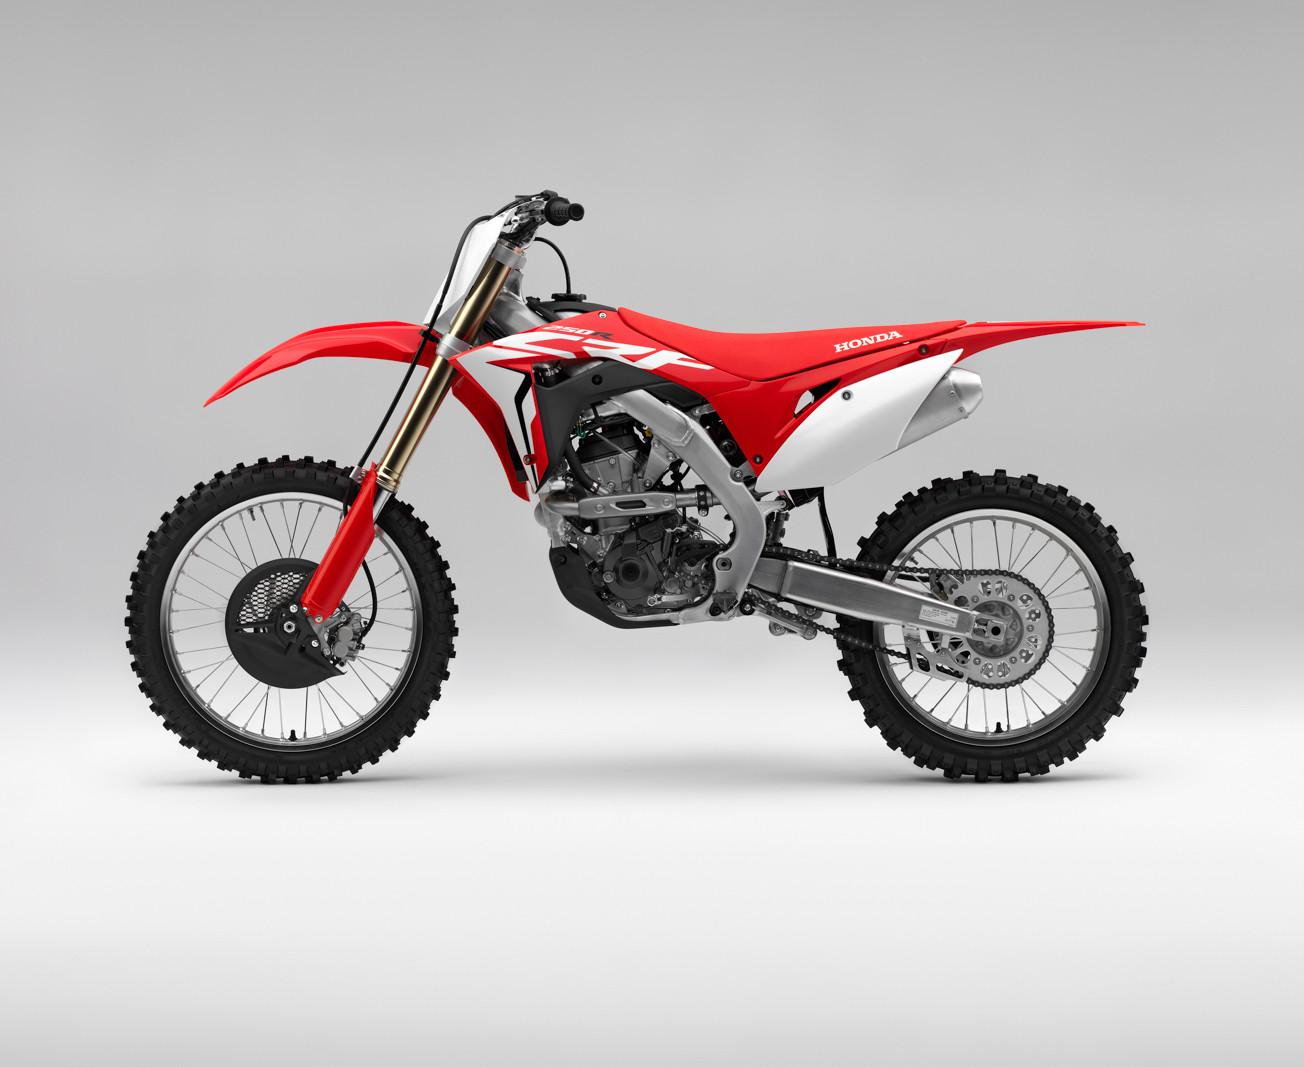 2018 honda crf250r reviews comparisons specs motocross dirt bike bikes vital mx. Black Bedroom Furniture Sets. Home Design Ideas